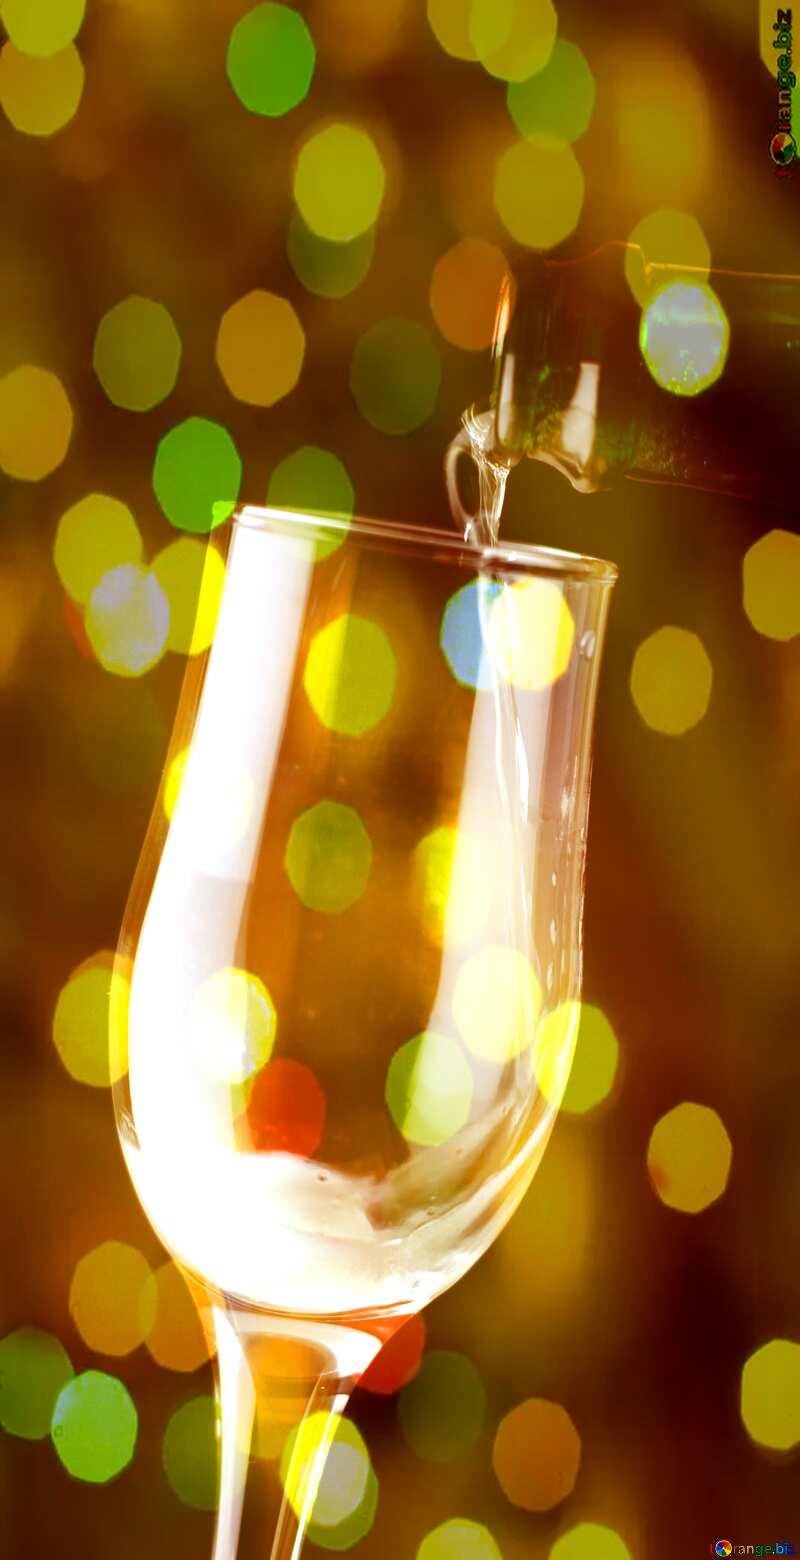 Foamy wine Wedding card background №25778